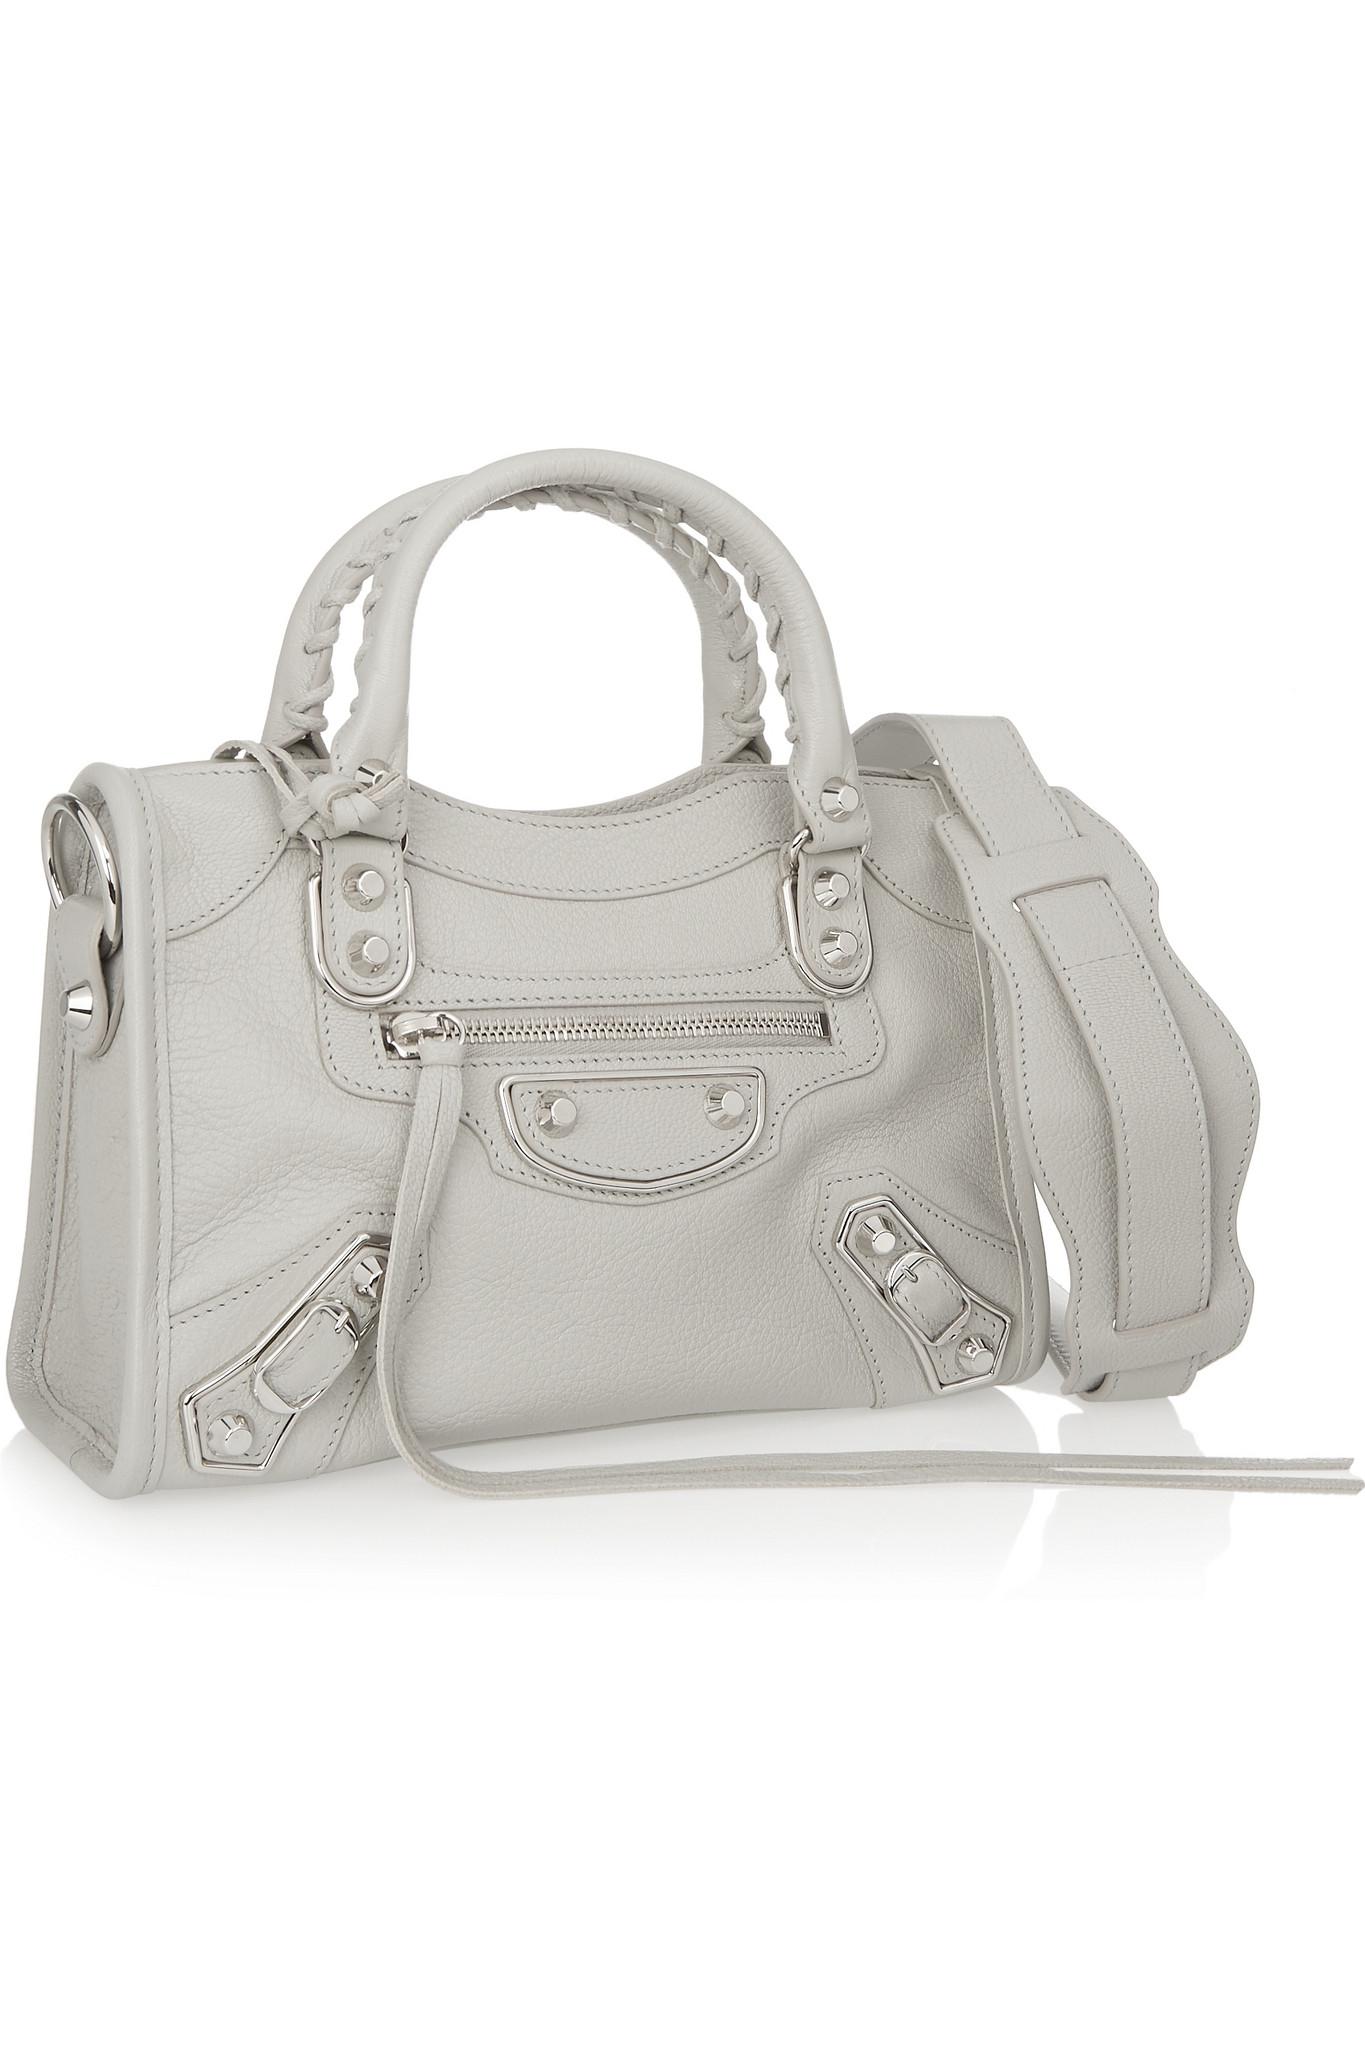 8a86fe235048 Lyst - Balenciaga Classic Metallic Edge City Mini Textured-leather ...